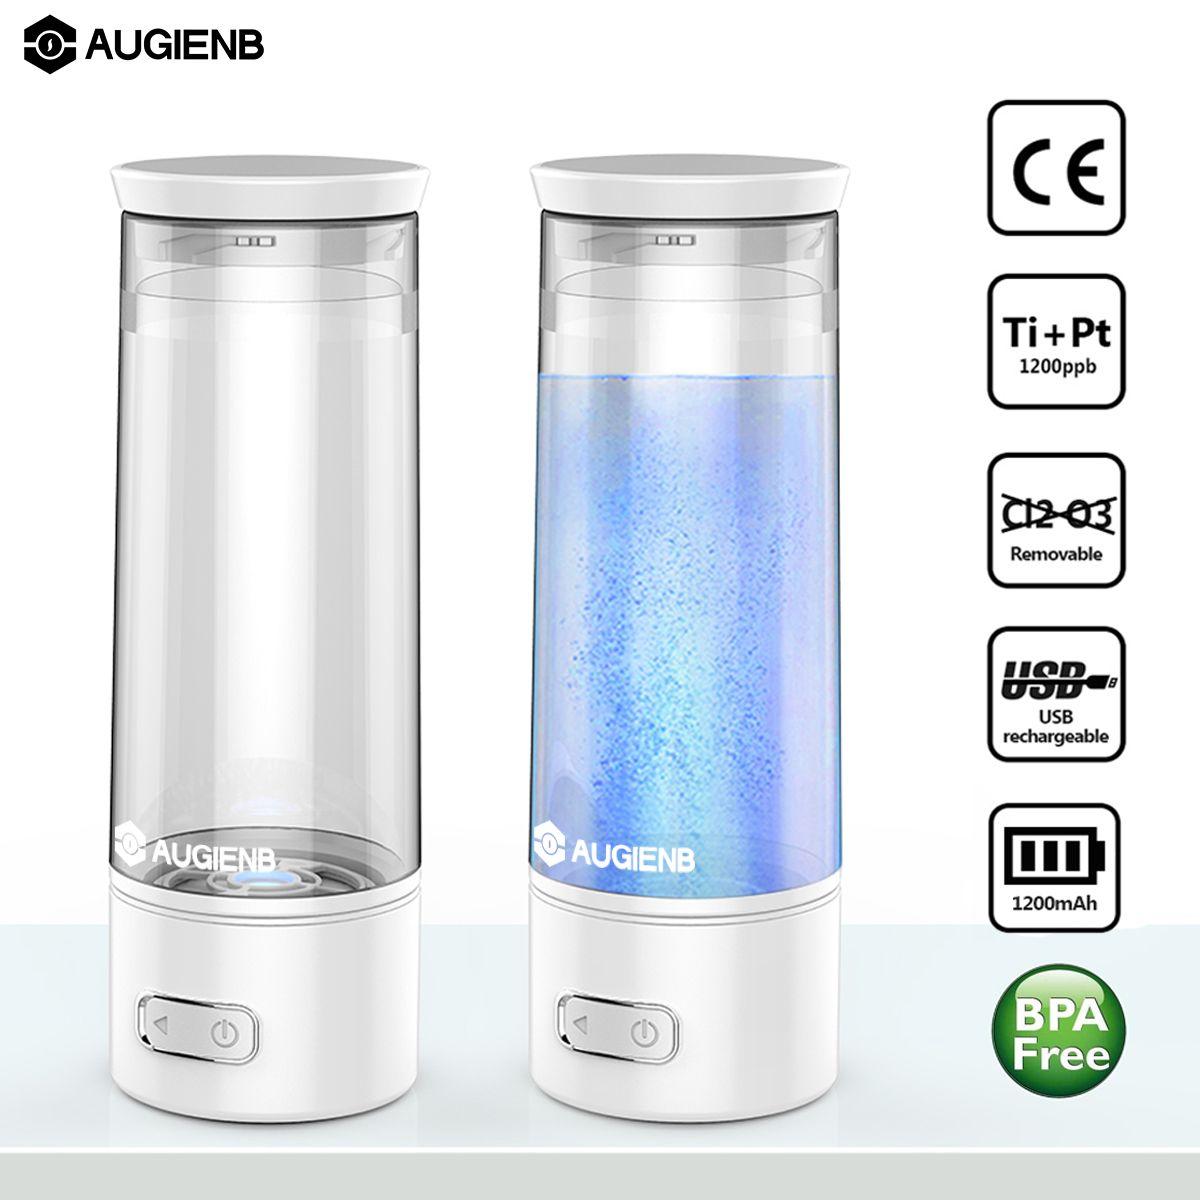 Augienb High-Rich Hydrogen Water Bottle Ionizer Generator Hydrogen Oxygen Separation Alkaline Energy Cup Filter USB Rechargable